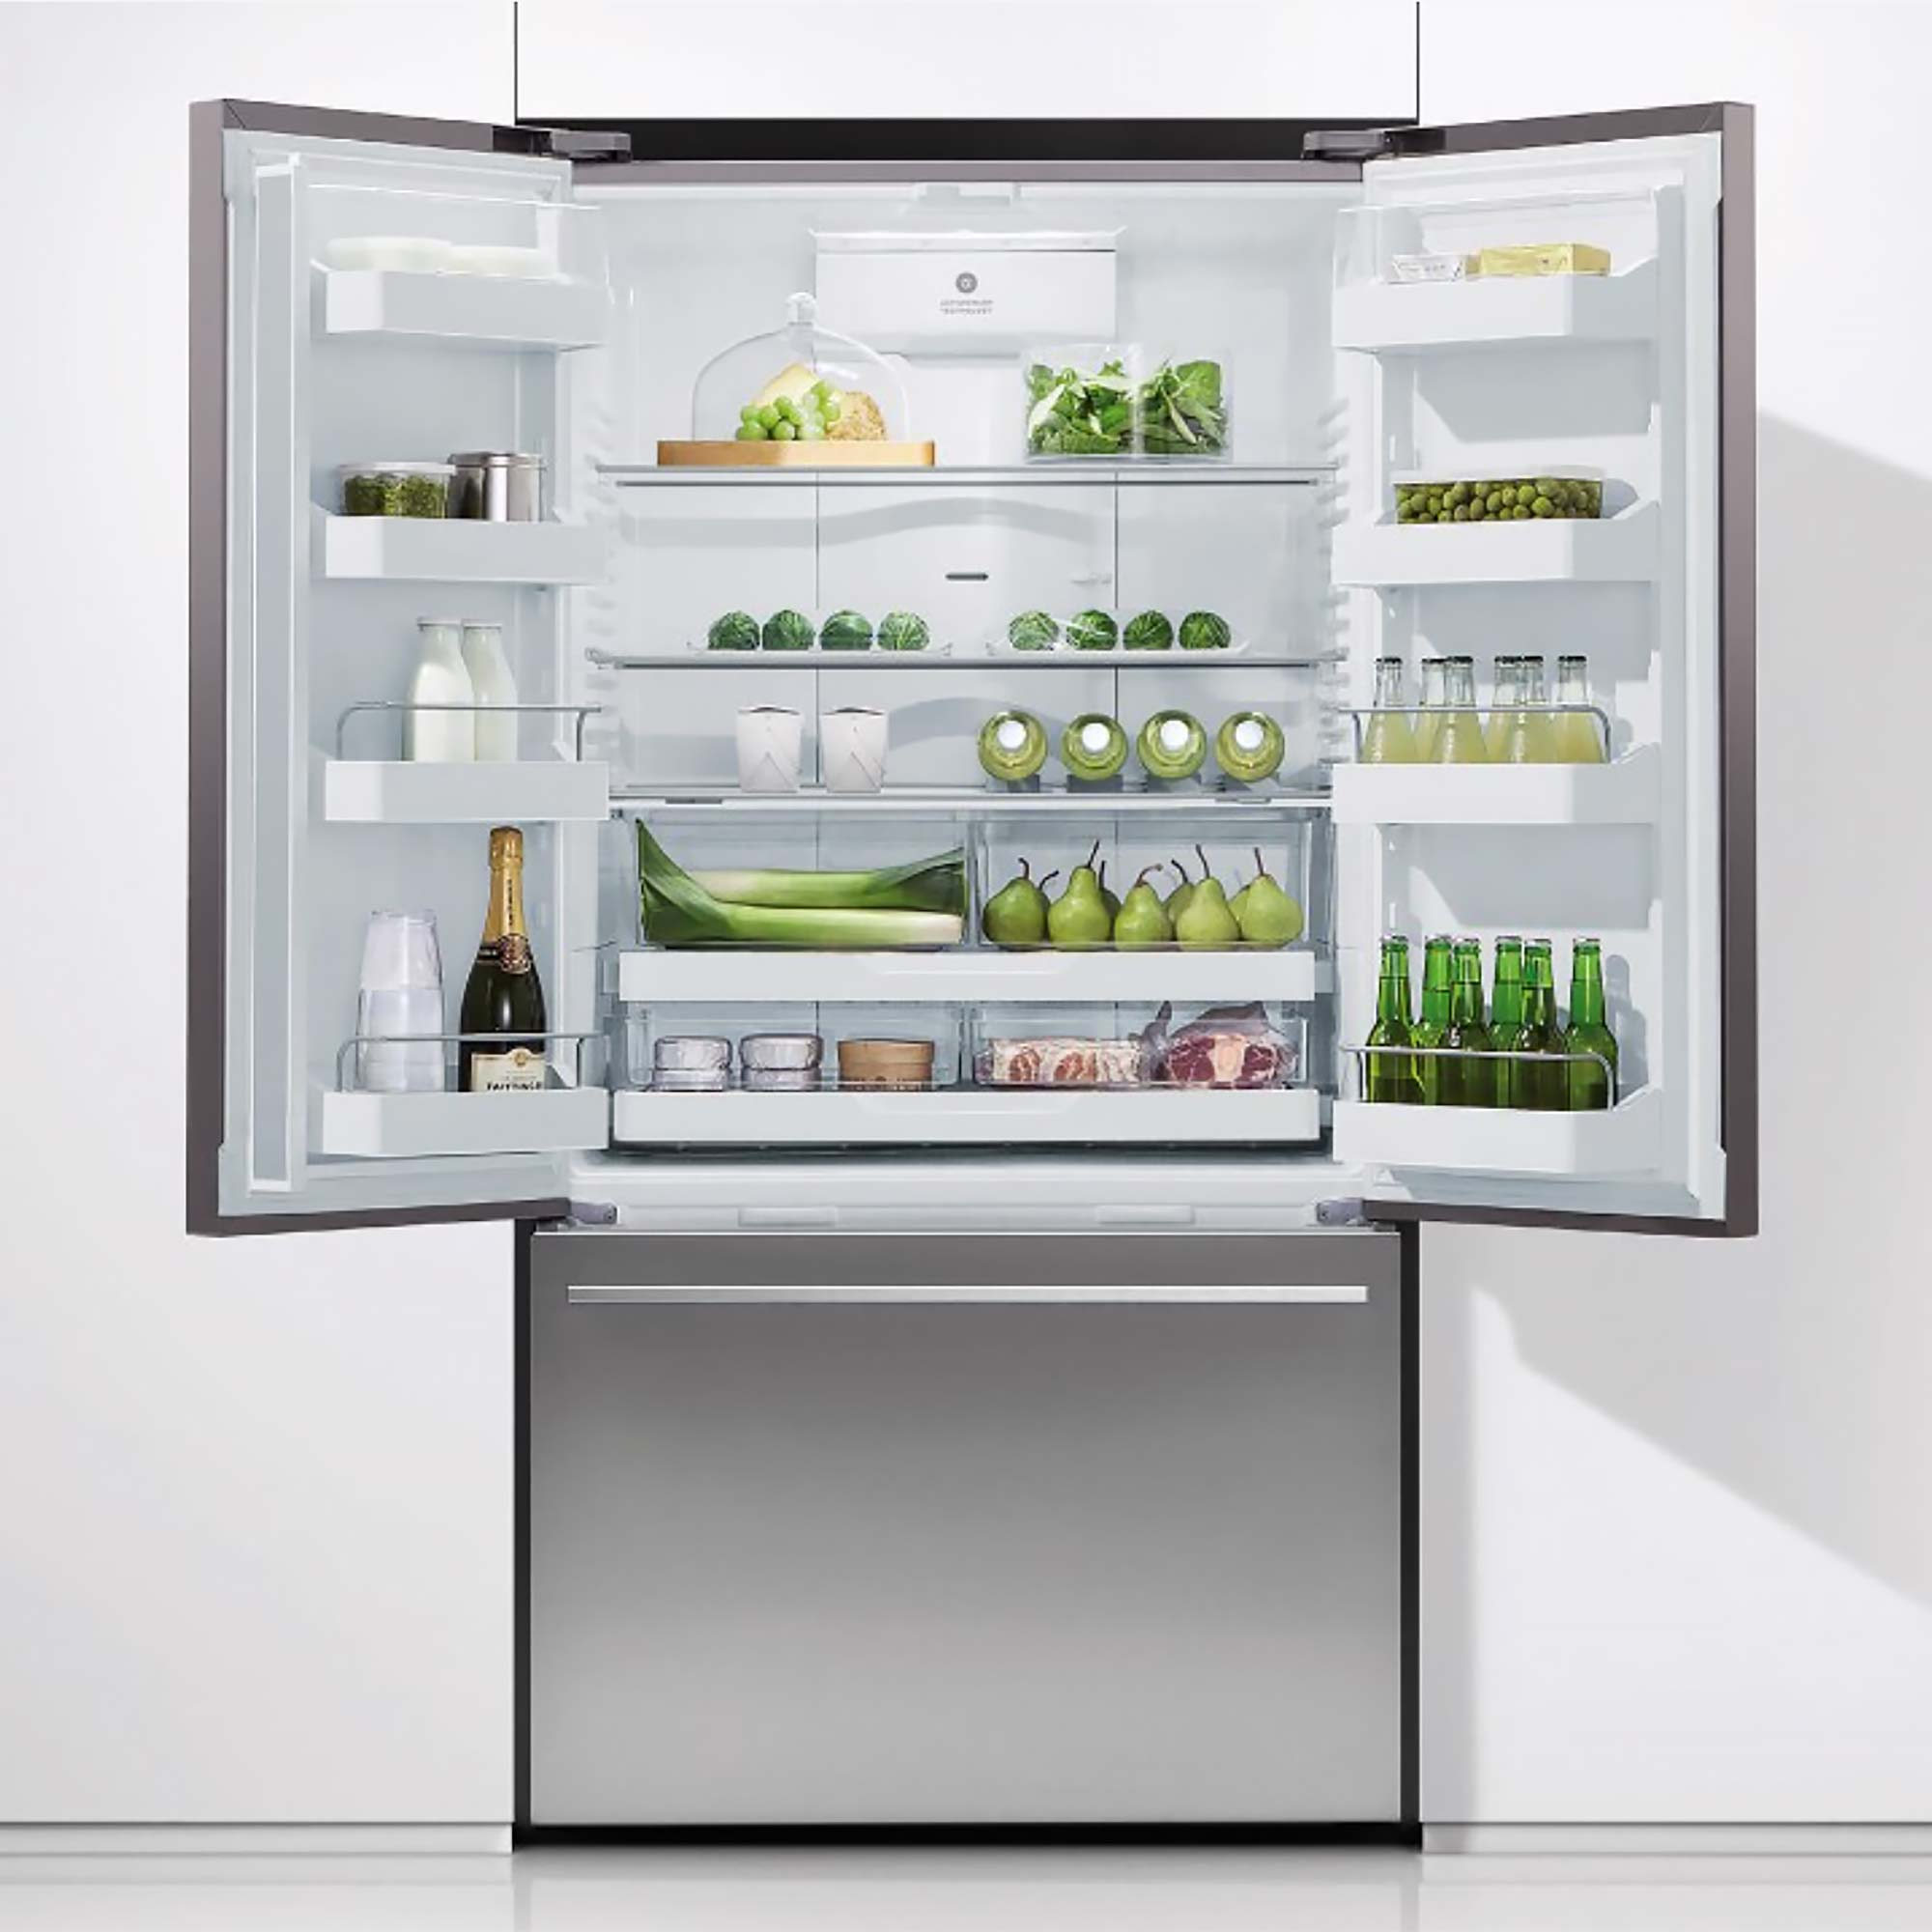 Fisher Paykel fridge